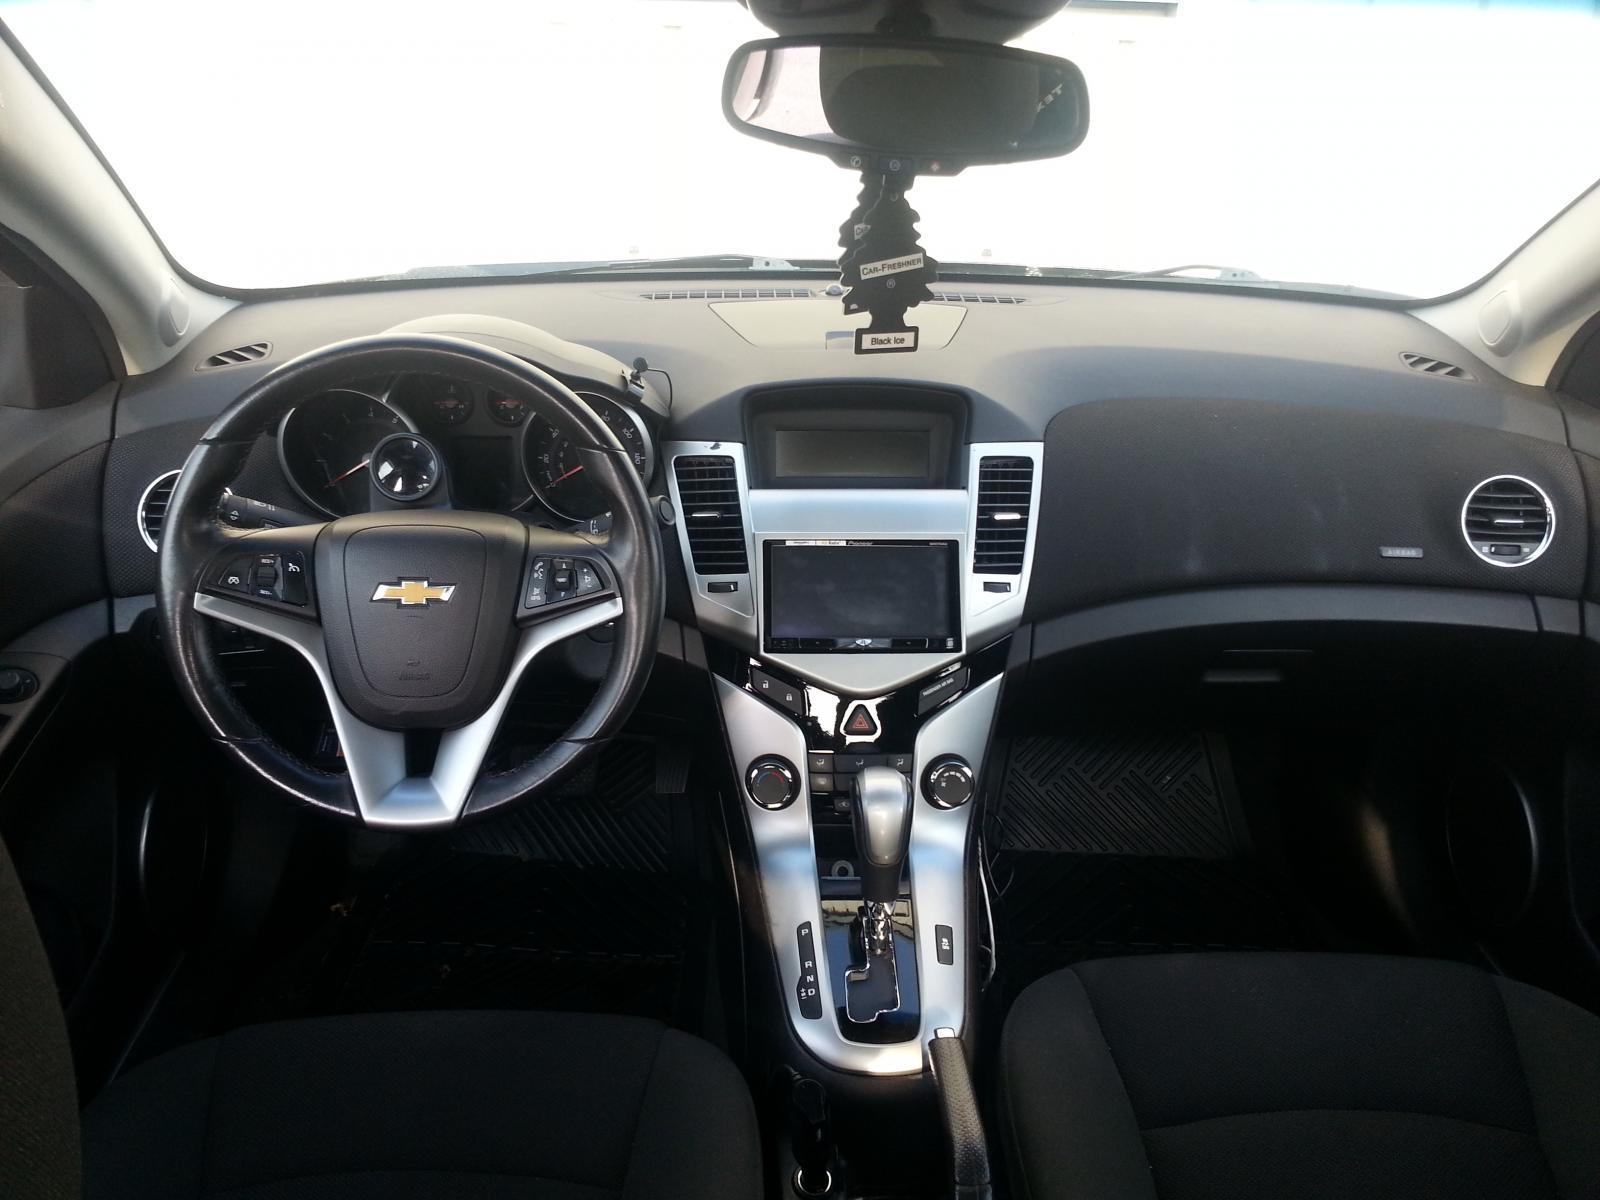 Aftermarket Cruze Parts For Sale Chevrolet Cruze Forums